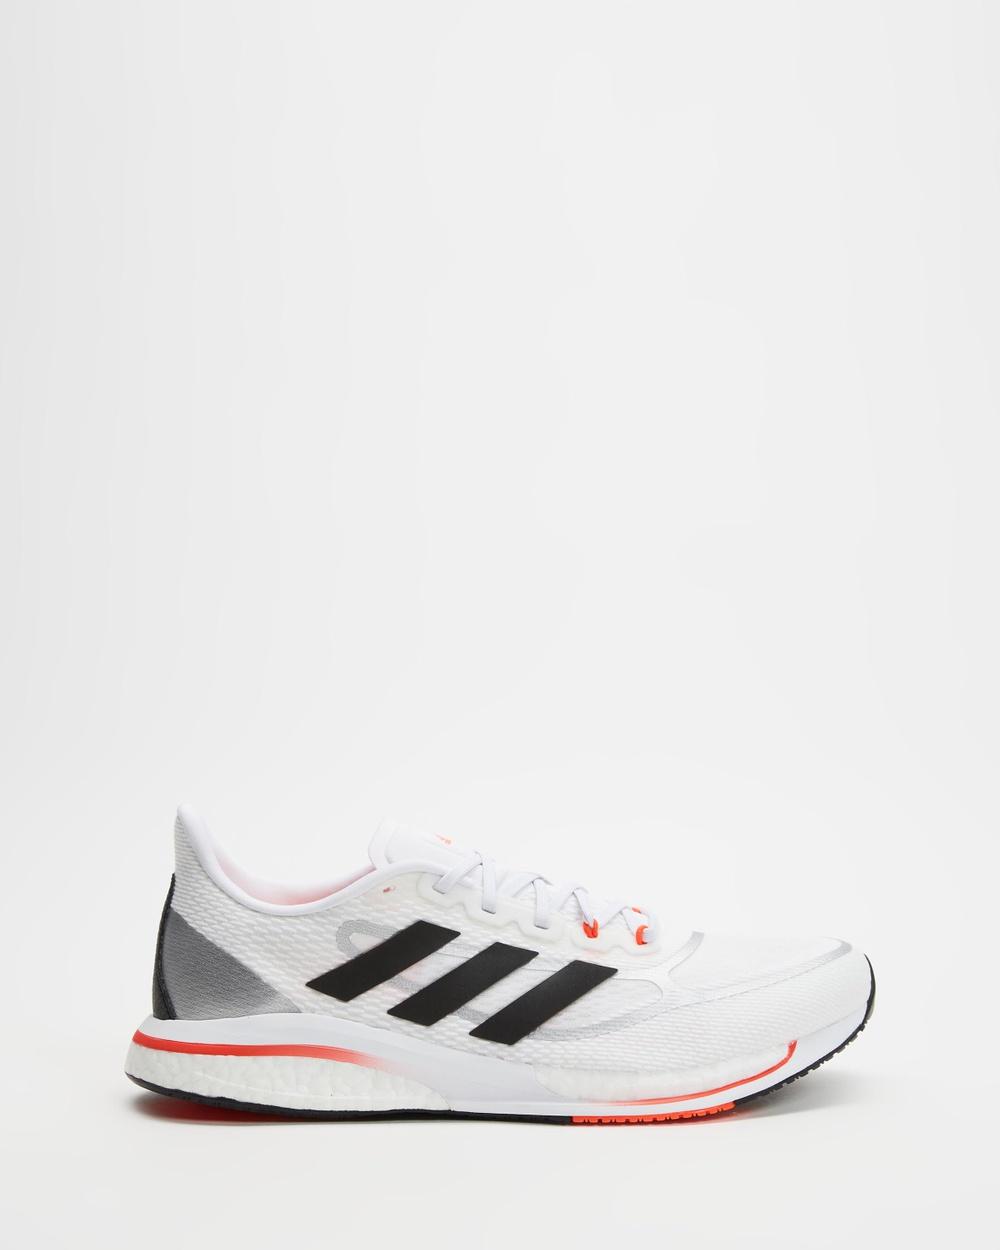 adidas Performance Supernova+ Shoes Men's Flutter White, Core Black & Solar Red